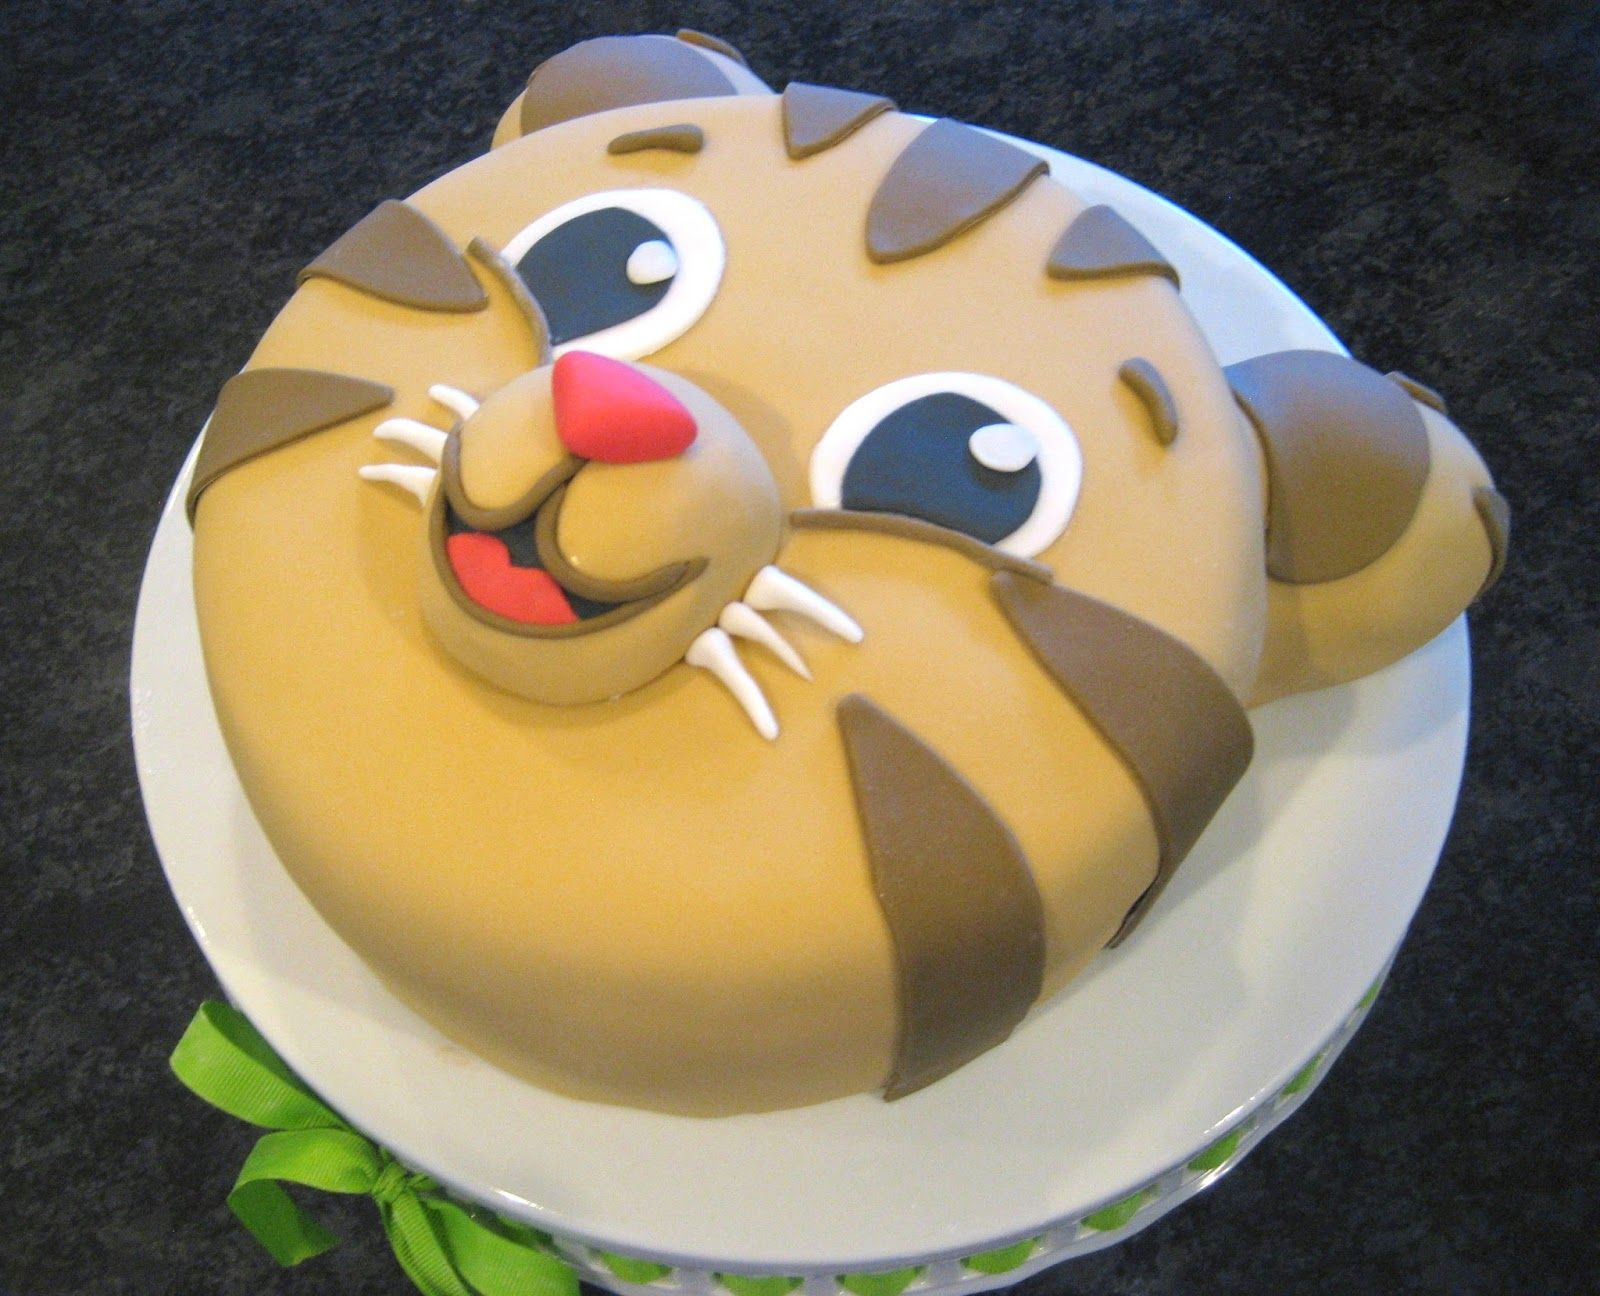 cupcake udesni gurmanski cupcakes Online torta Poetna dostava